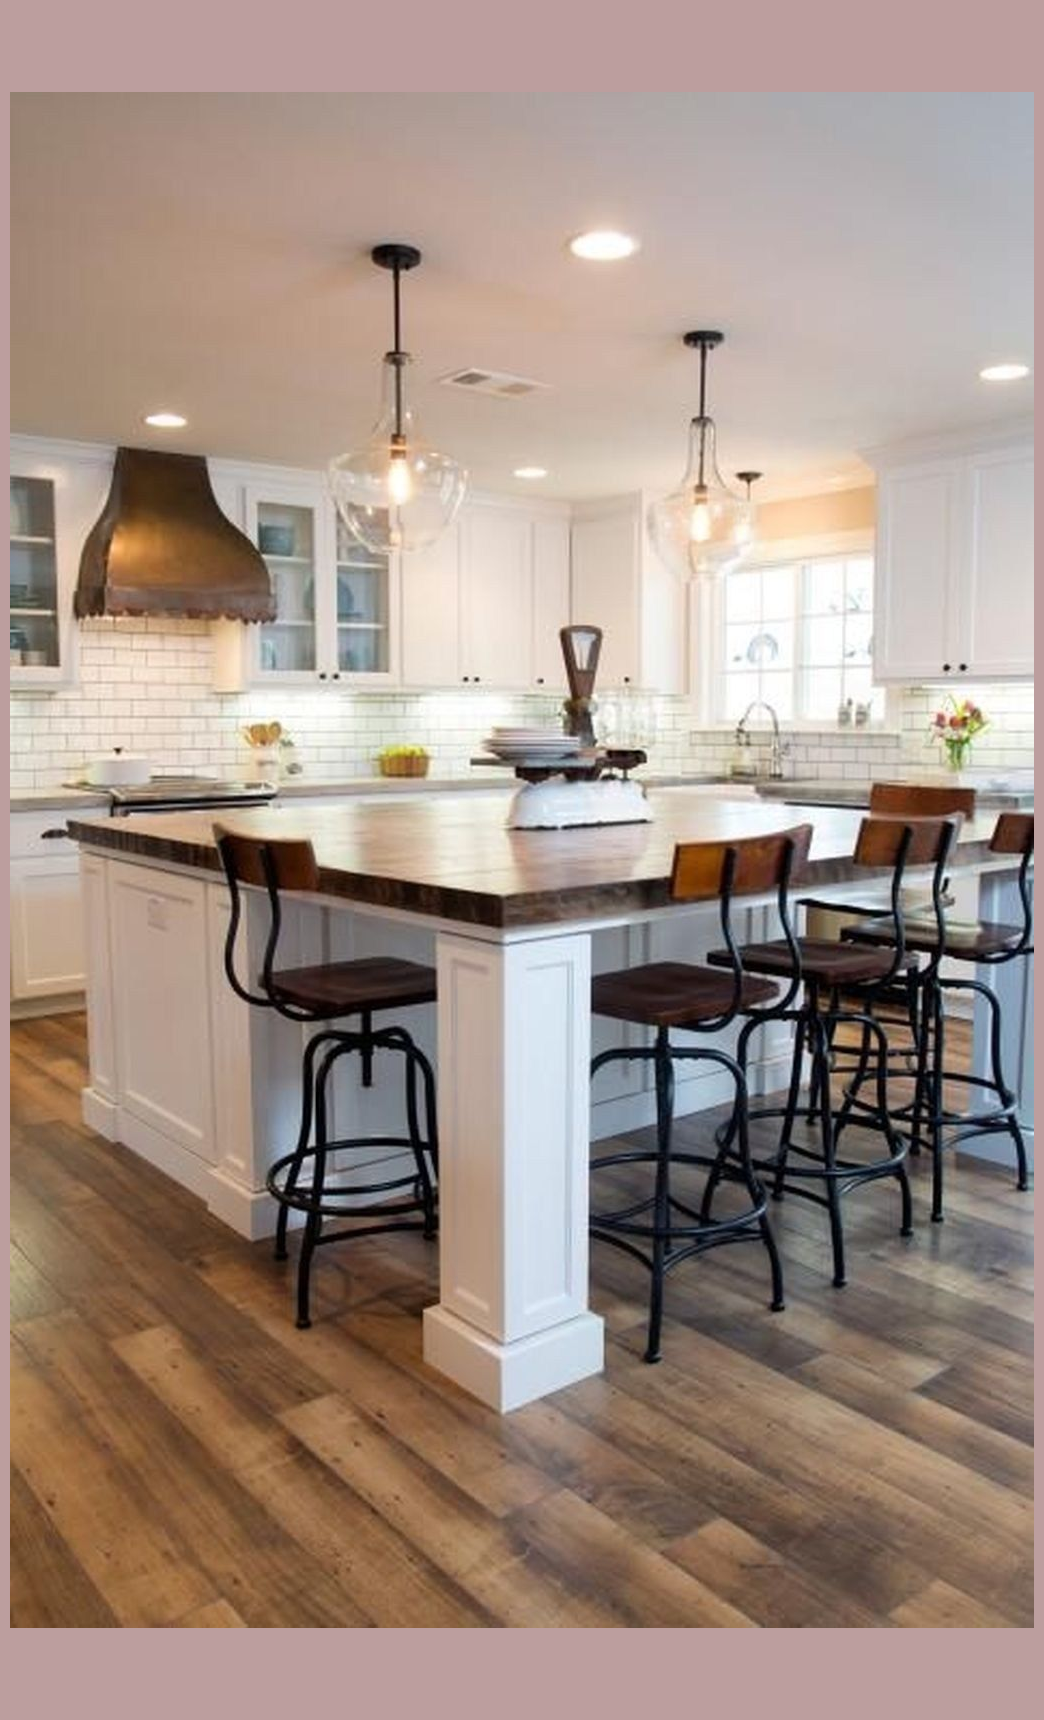 pinterest kitchen island decor outdoor kitchen countertops kitchen island with bench seating on outdoor kitchen island id=29567